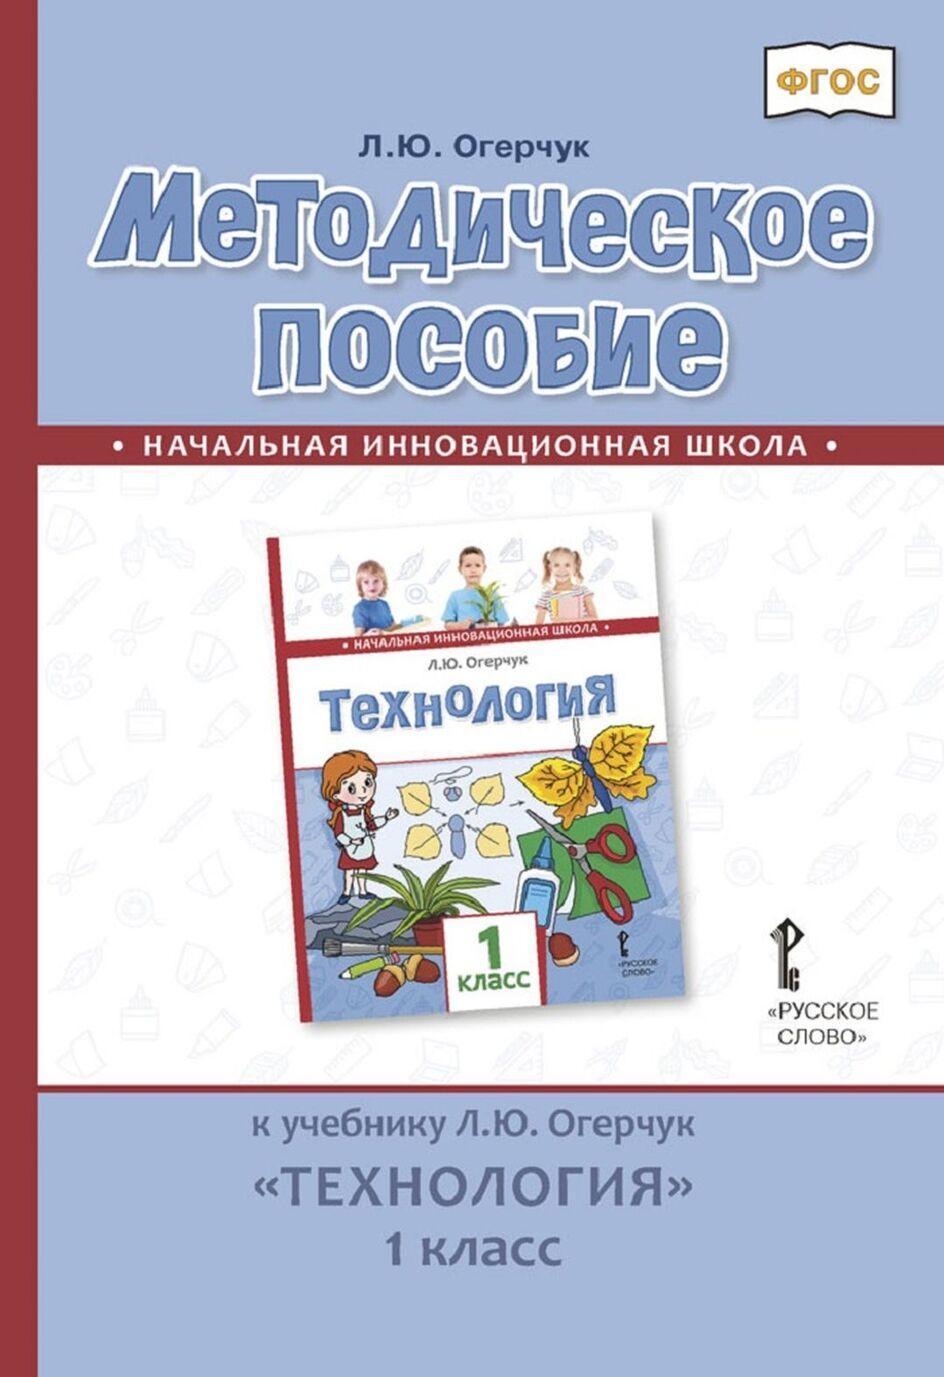 "Metodicheskoe posobie k uchebniku L.Ju. Ogerchuk ""Tekhnologija"". 1 klasc"